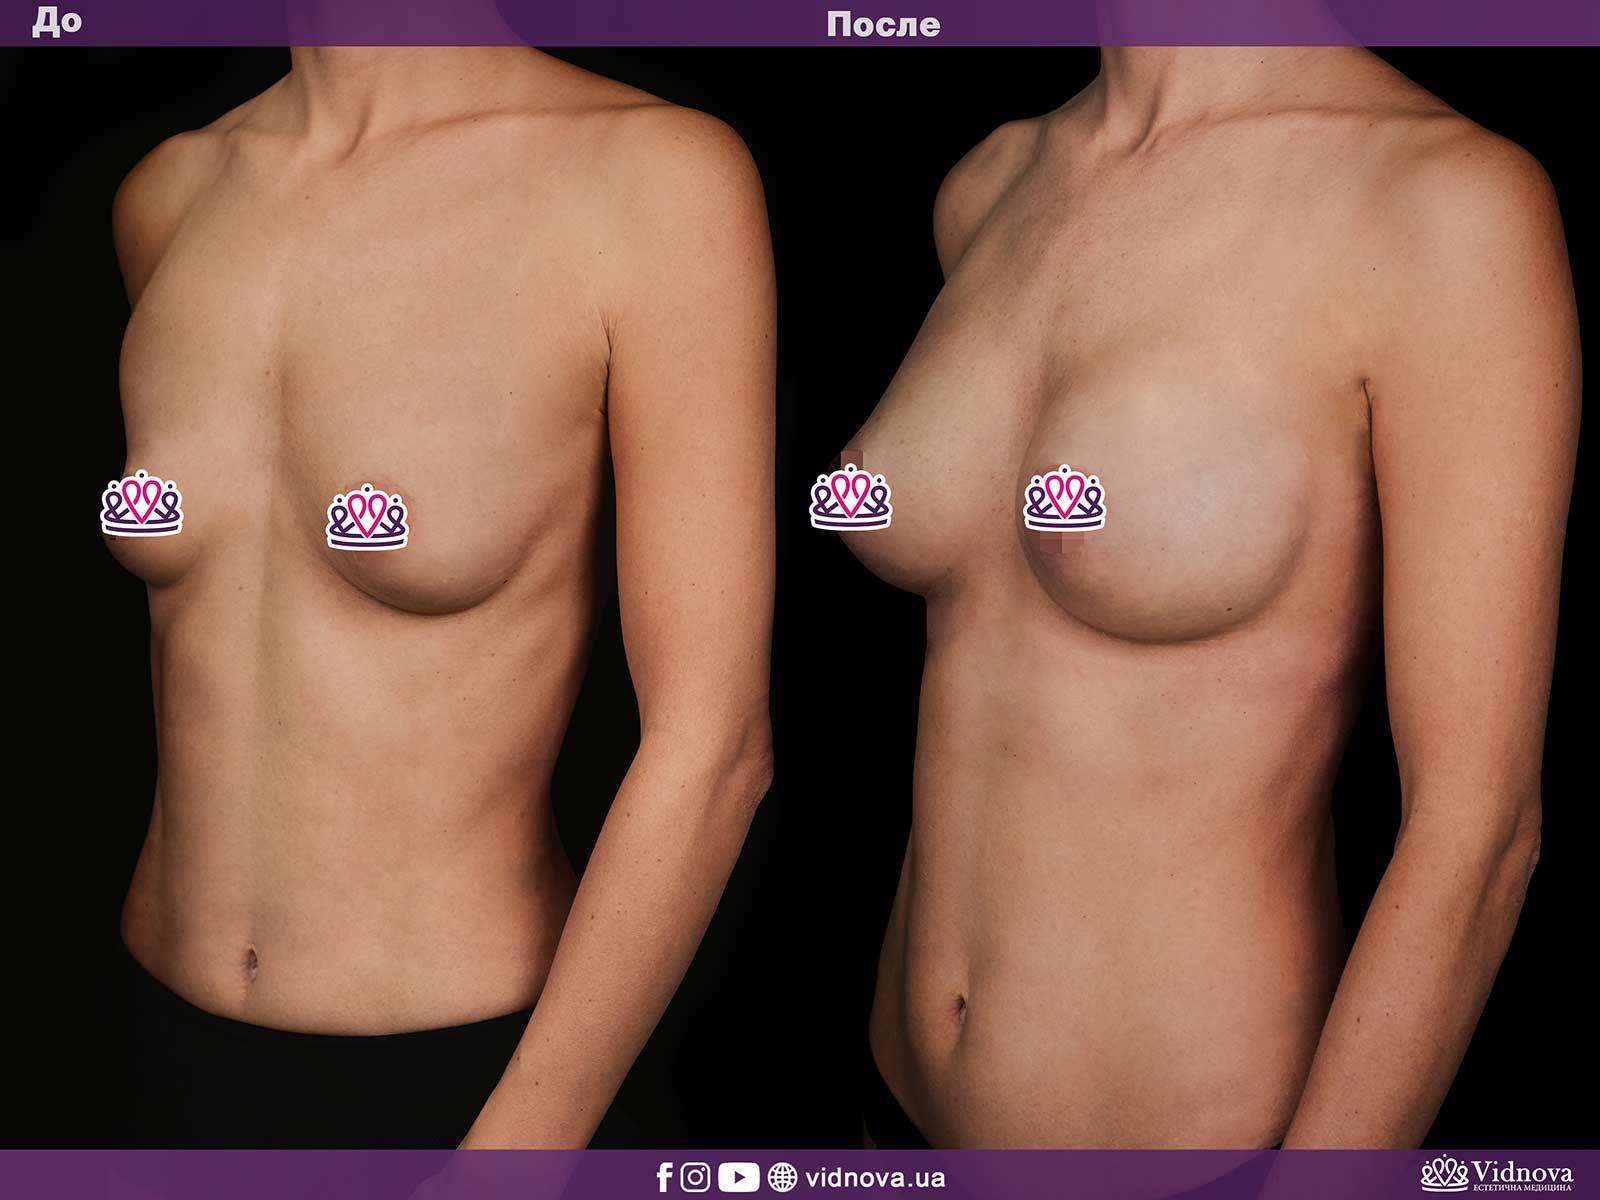 Увеличение груди: Фото ДО и ПОСЛЕ - Пример №17-2 - Клиника Vidnova